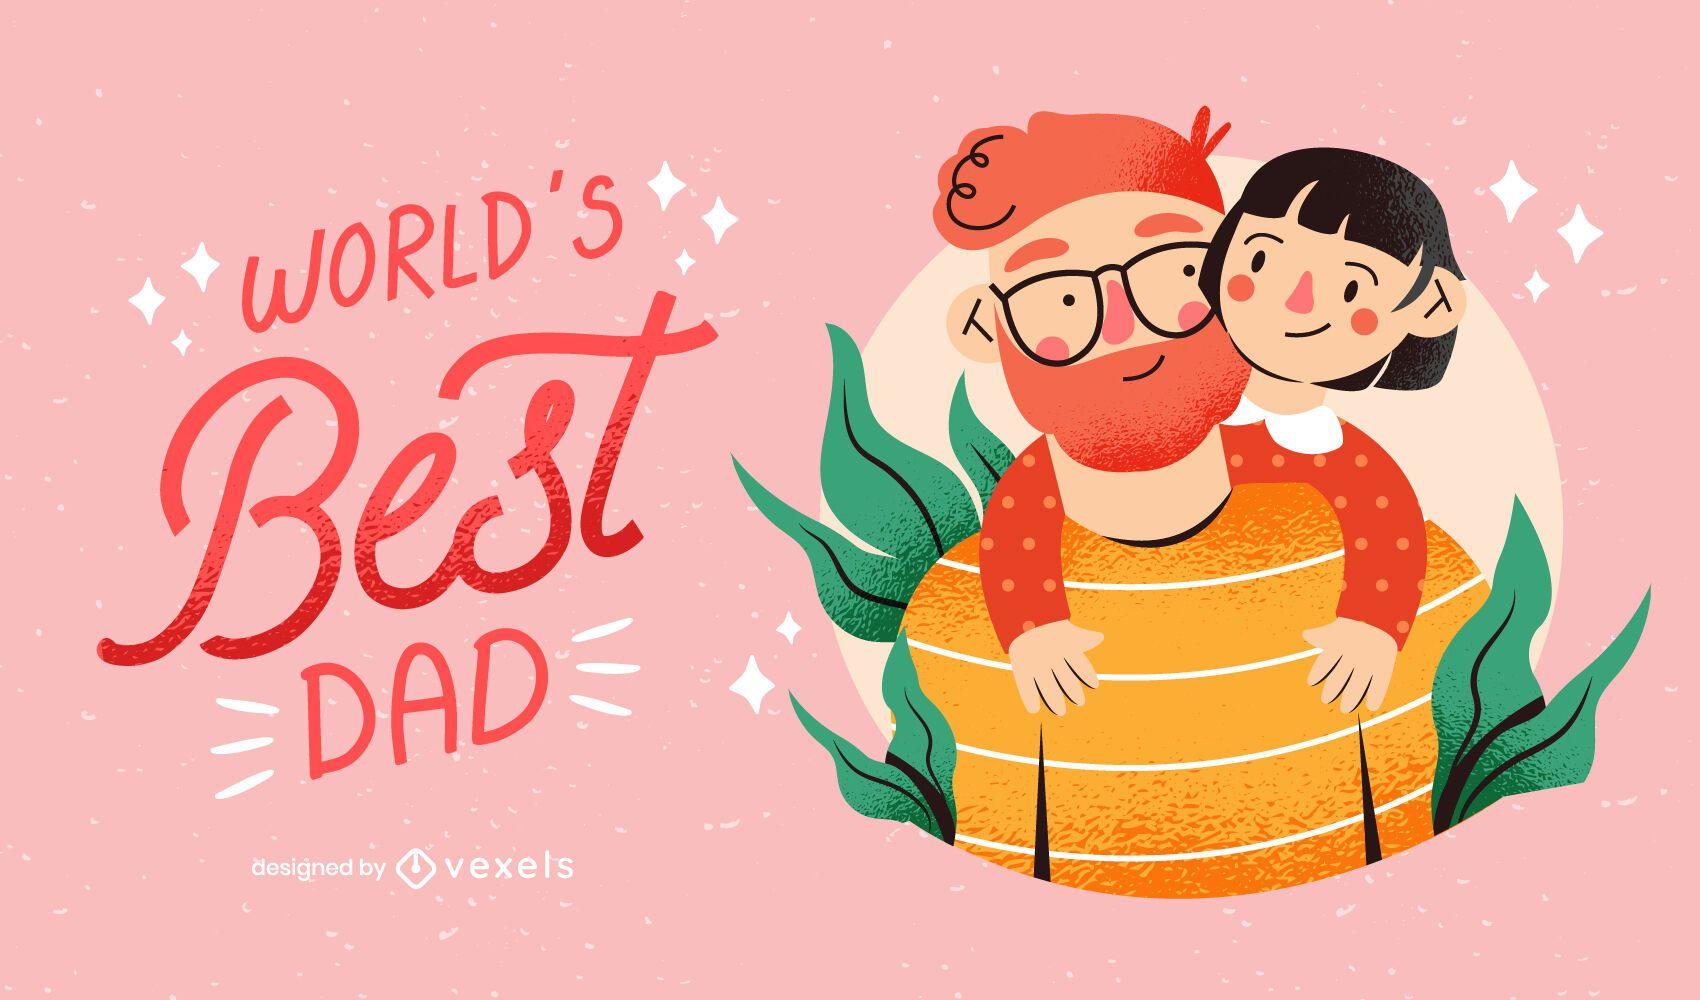 World's best dad family illustration